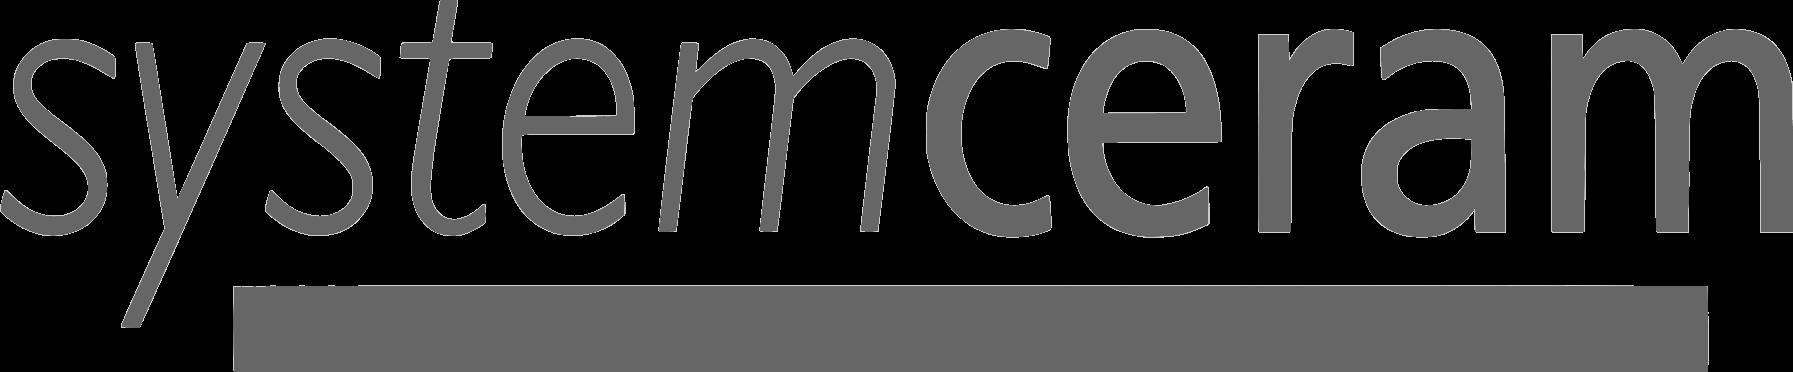 systemceram logo